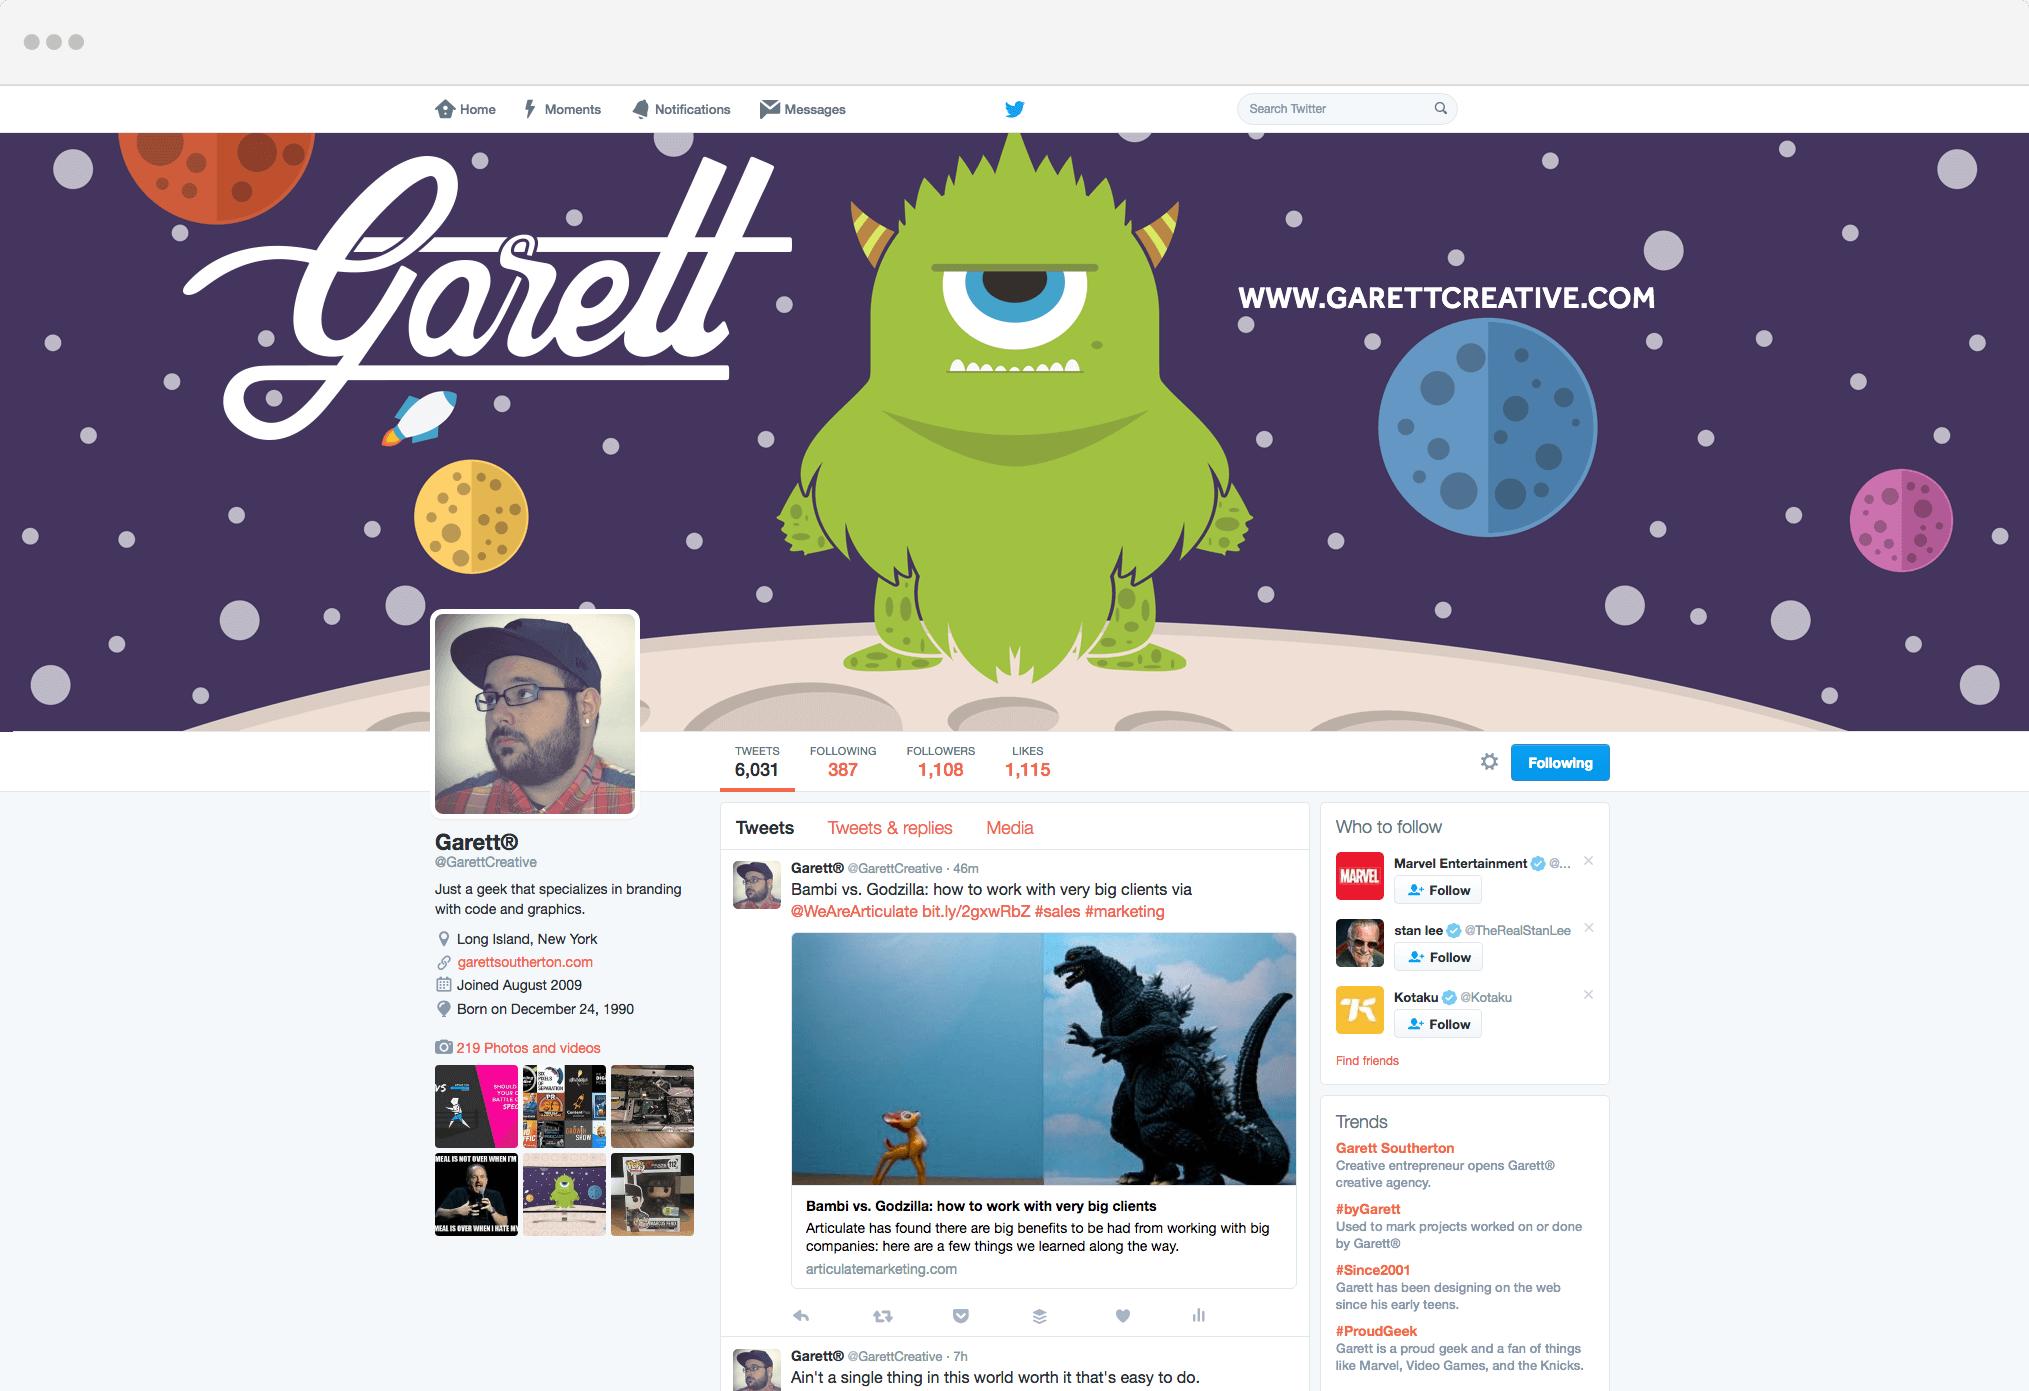 Garett's Twitter Page